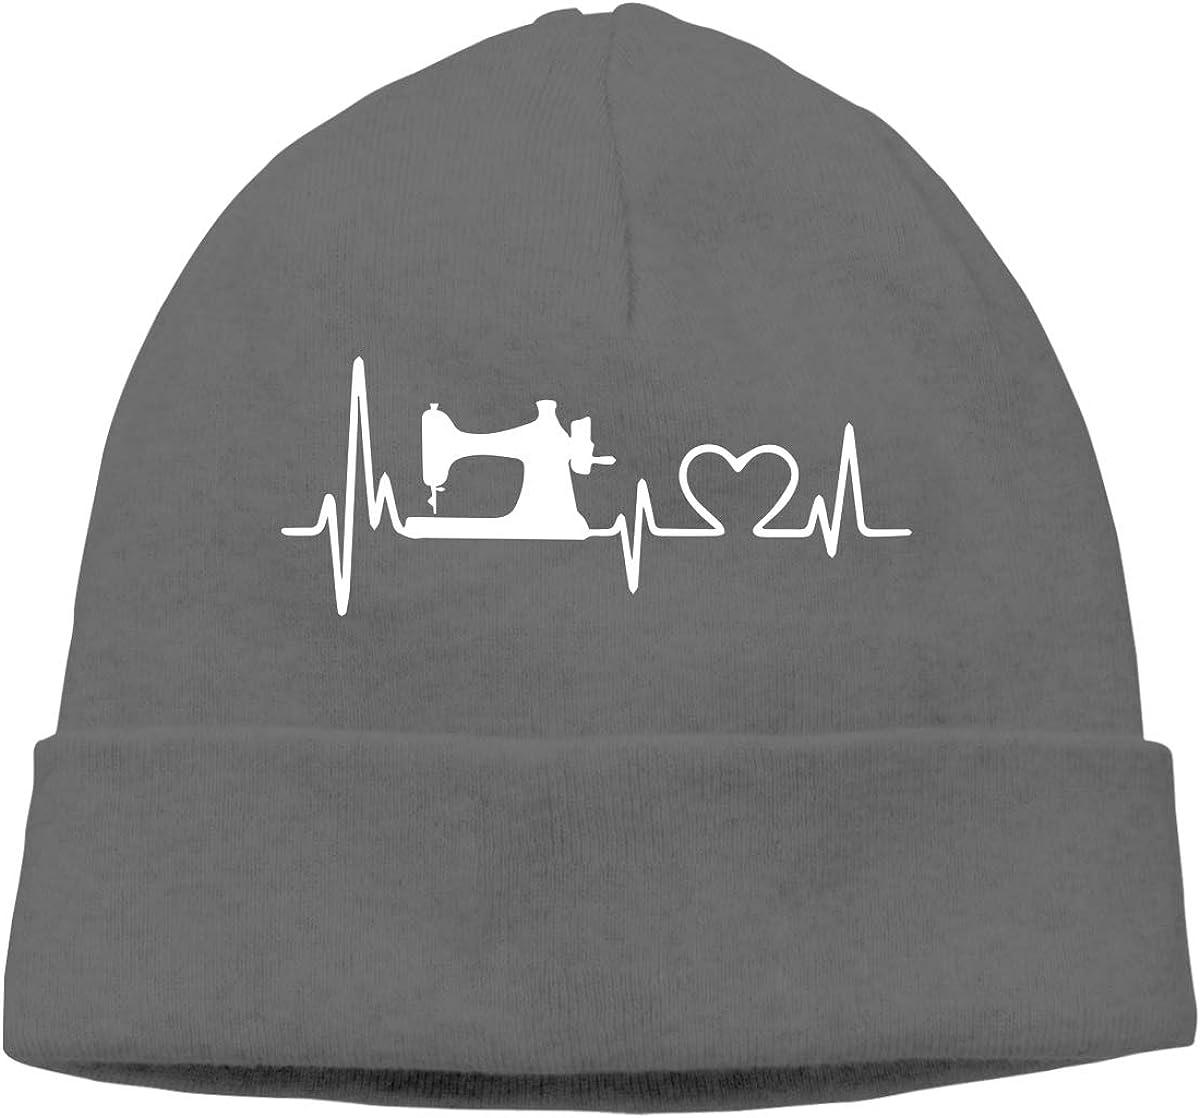 Mens/&Womens Sewing Heartbeat Soft Skull Beanie Cap Soft Hat